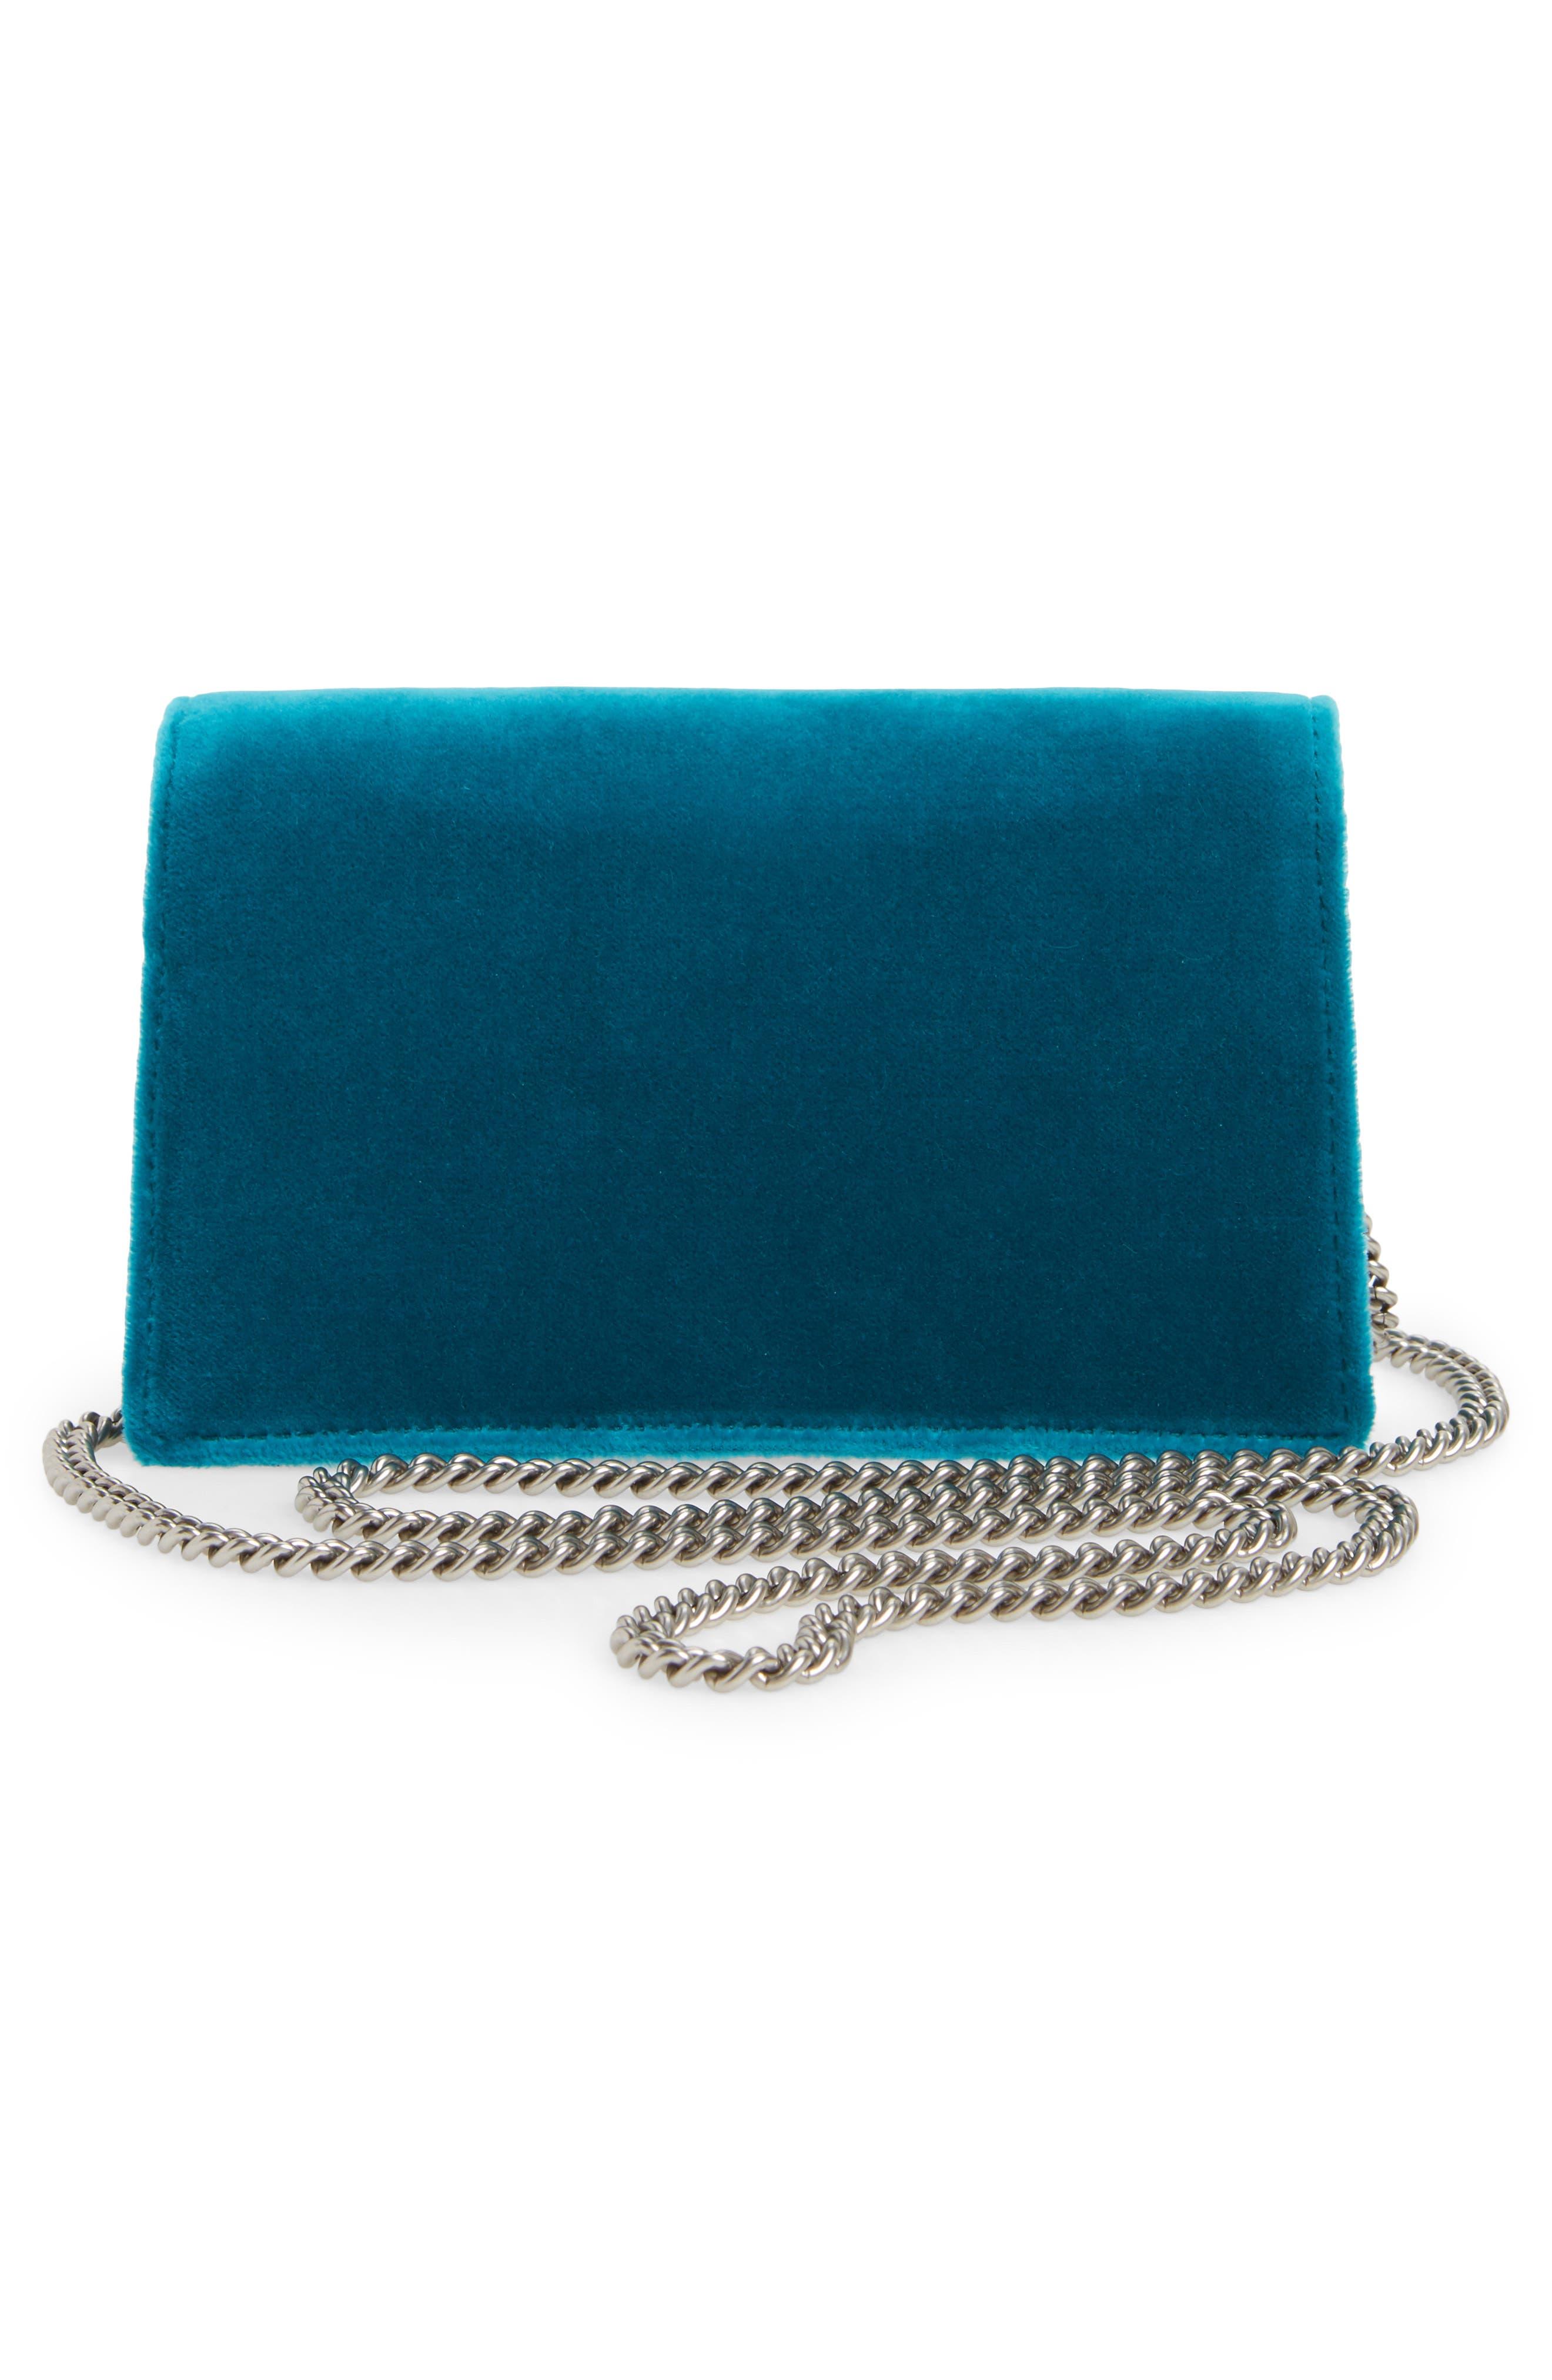 GUCCI, Super Mini Dionysus Velvet Shoulder Bag, Alternate thumbnail 3, color, PIVONE